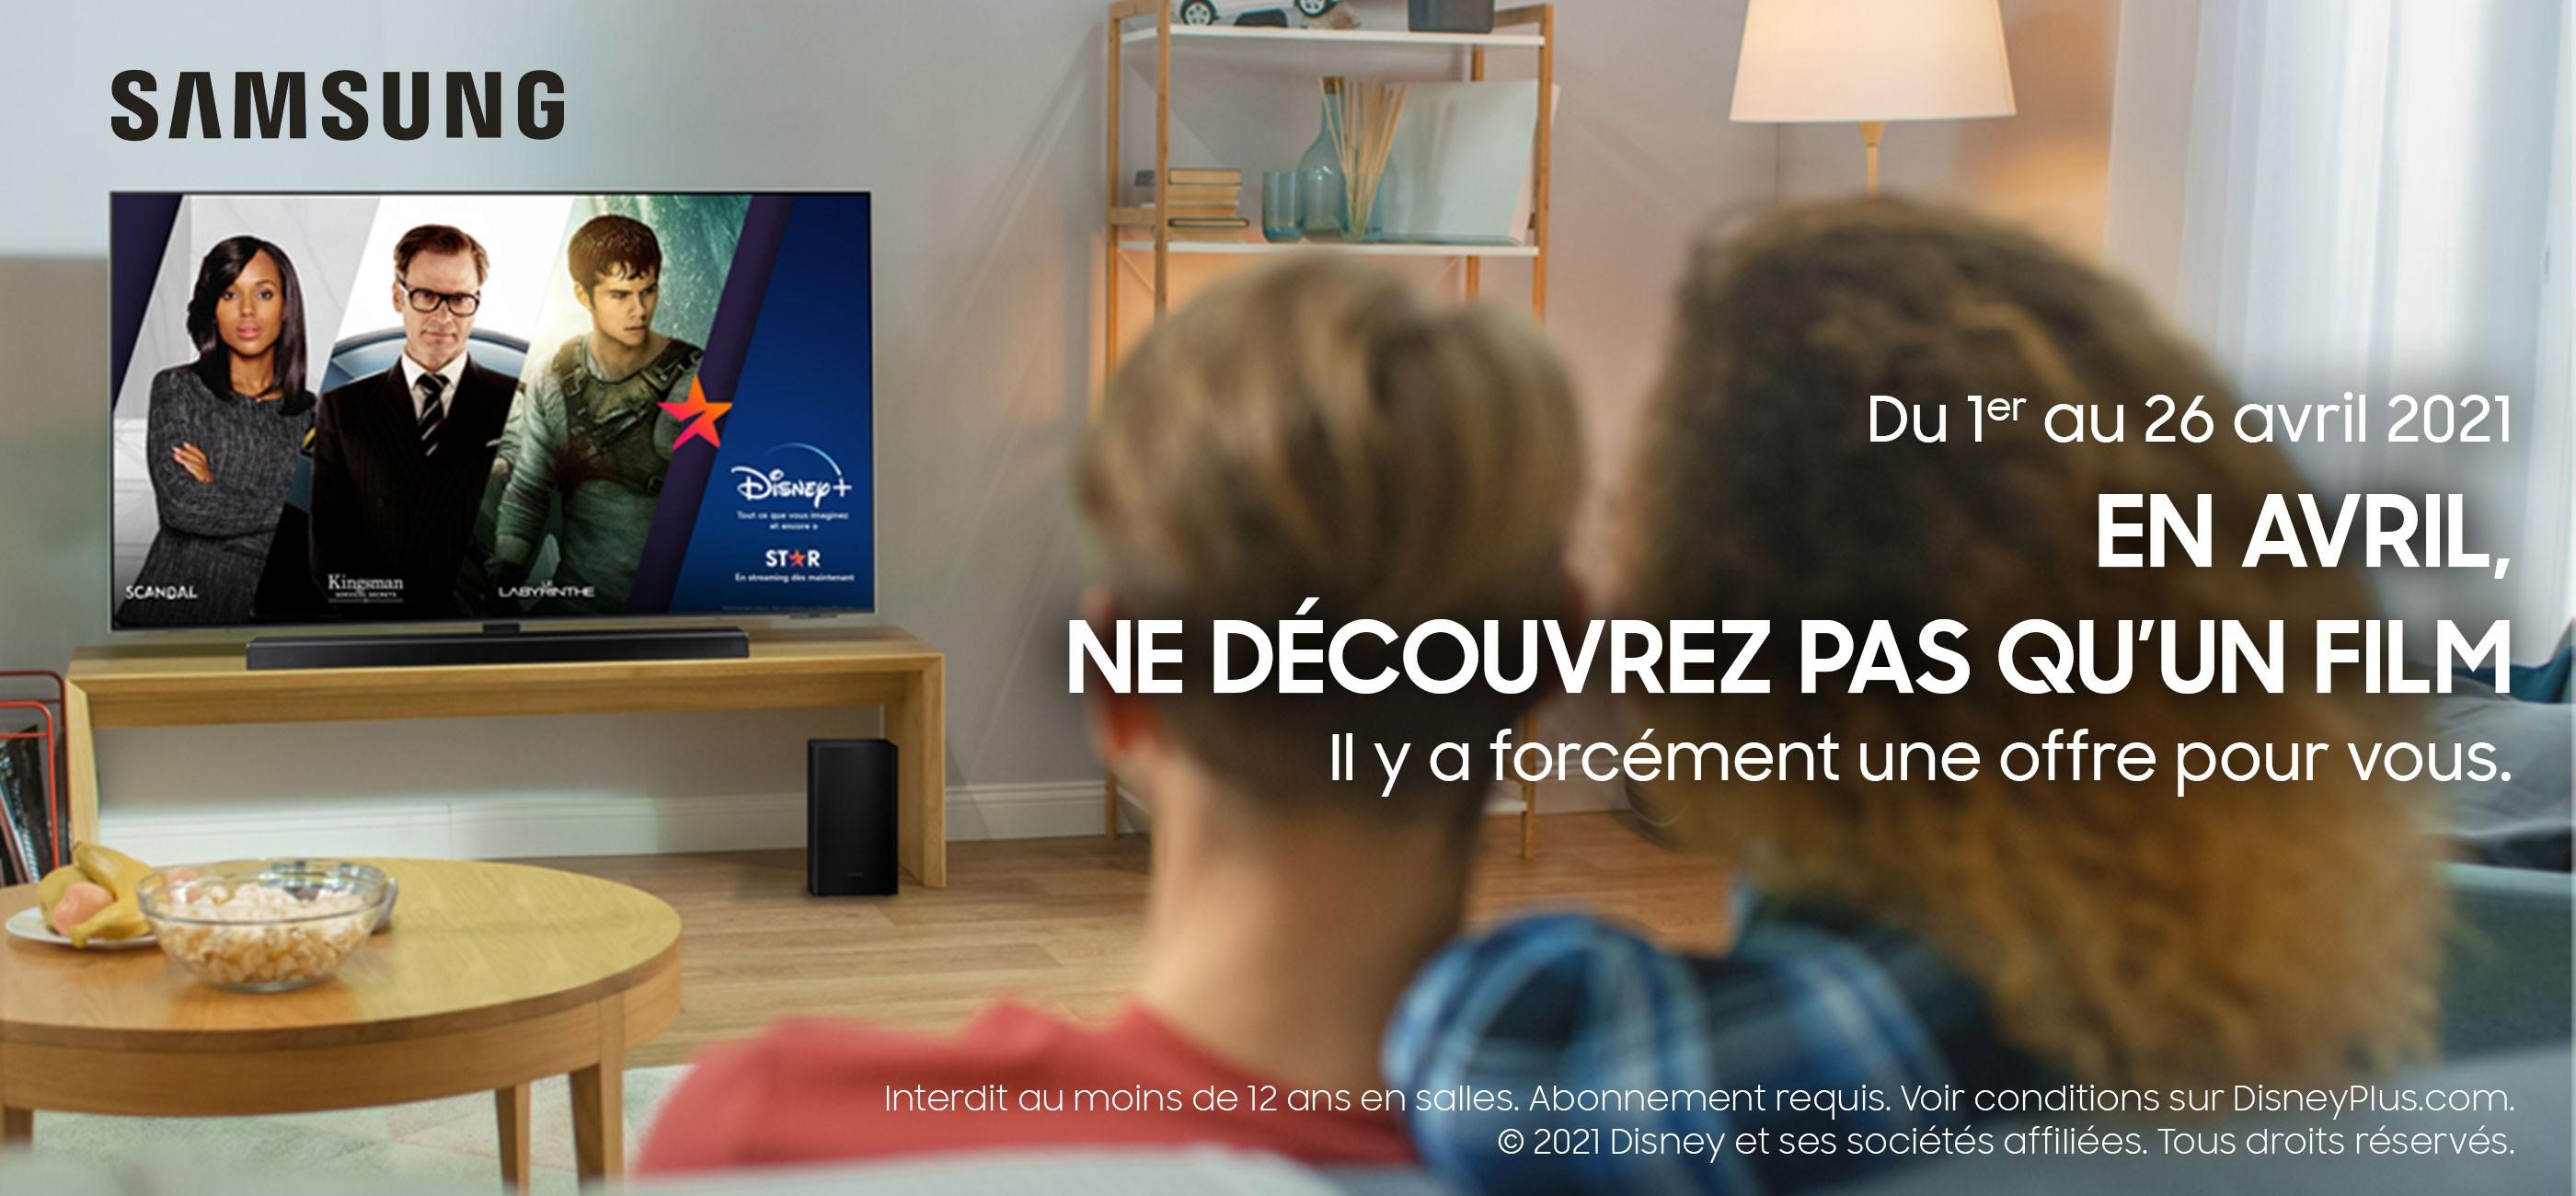 Offre Samsung / Disney +